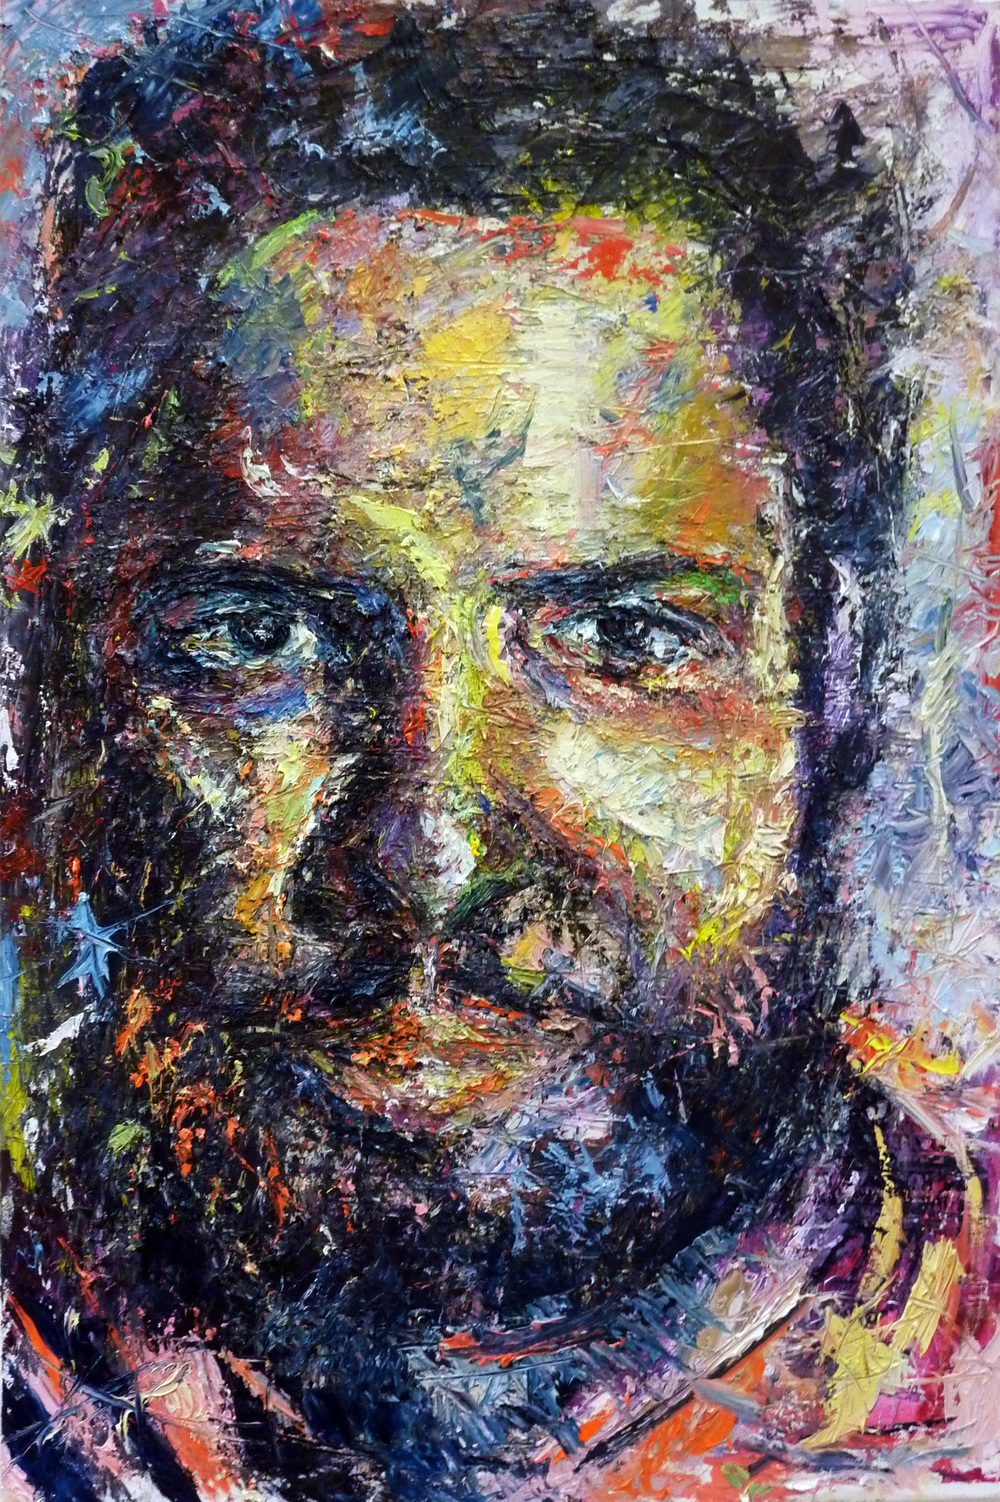 Soujourner,  oil on canvas, 150 x 100 cm, 2015.